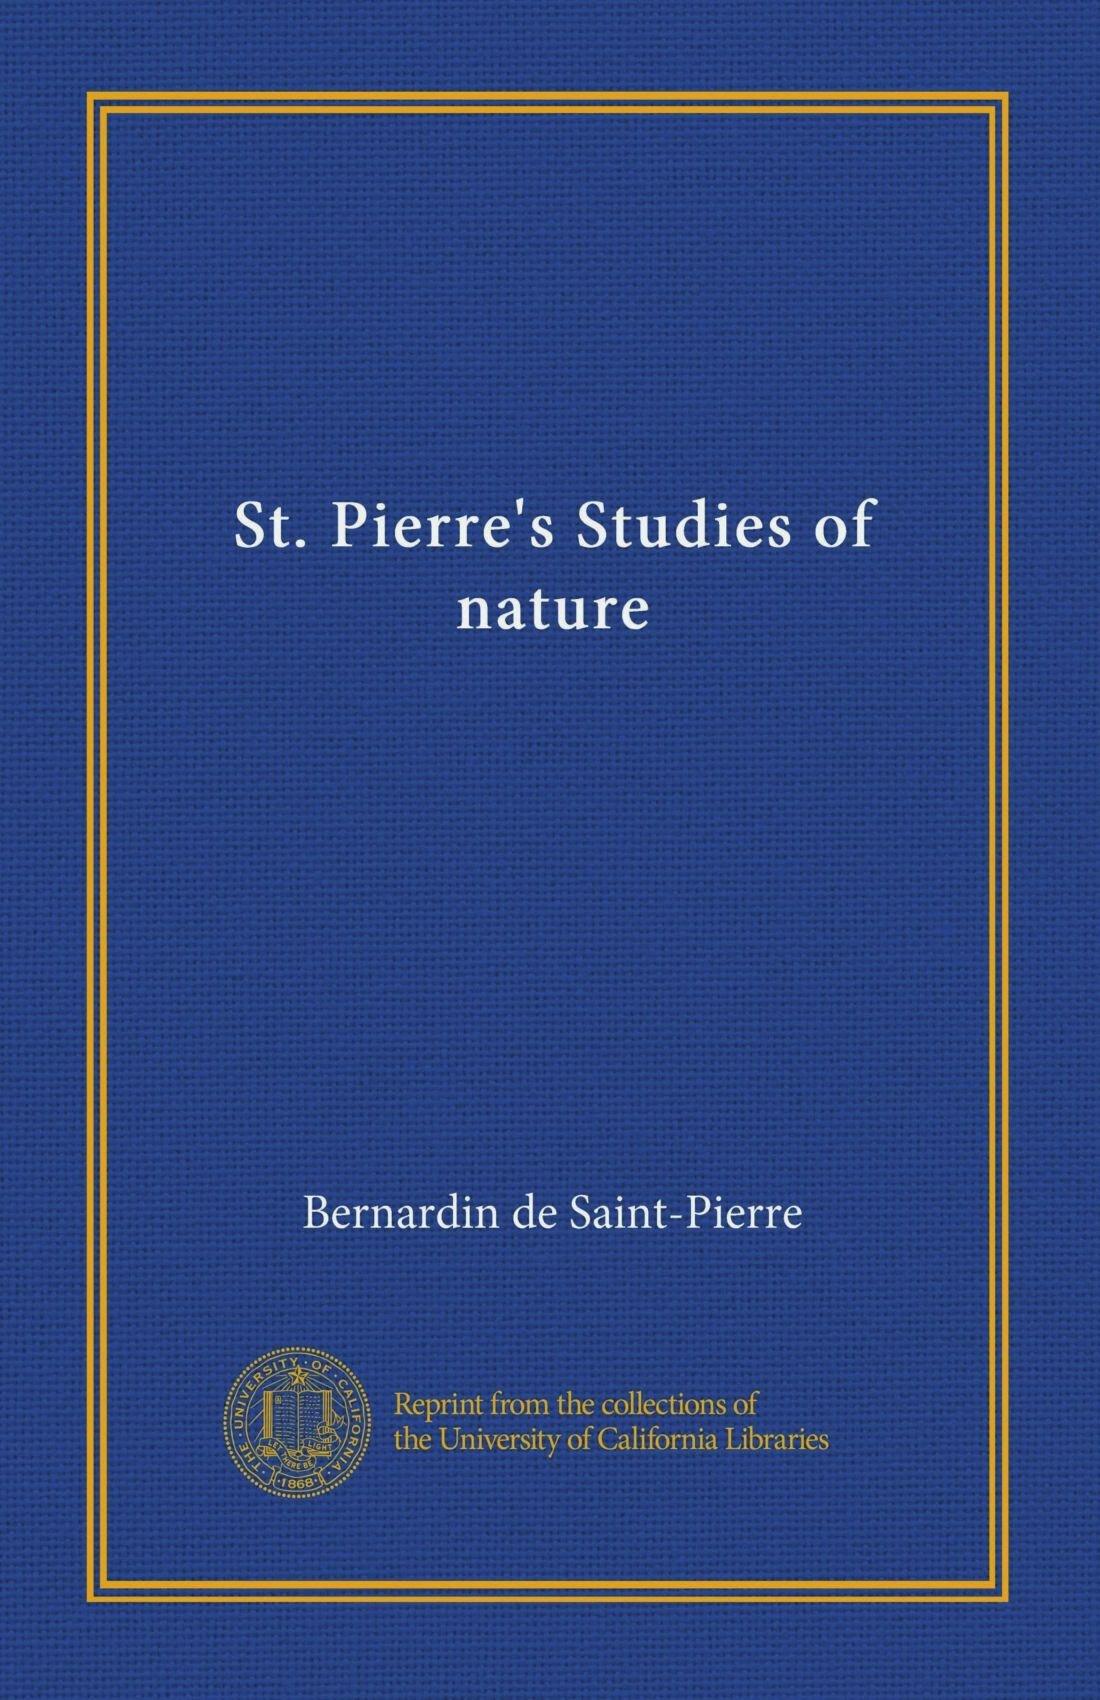 St. Pierre's Studies of nature ebook